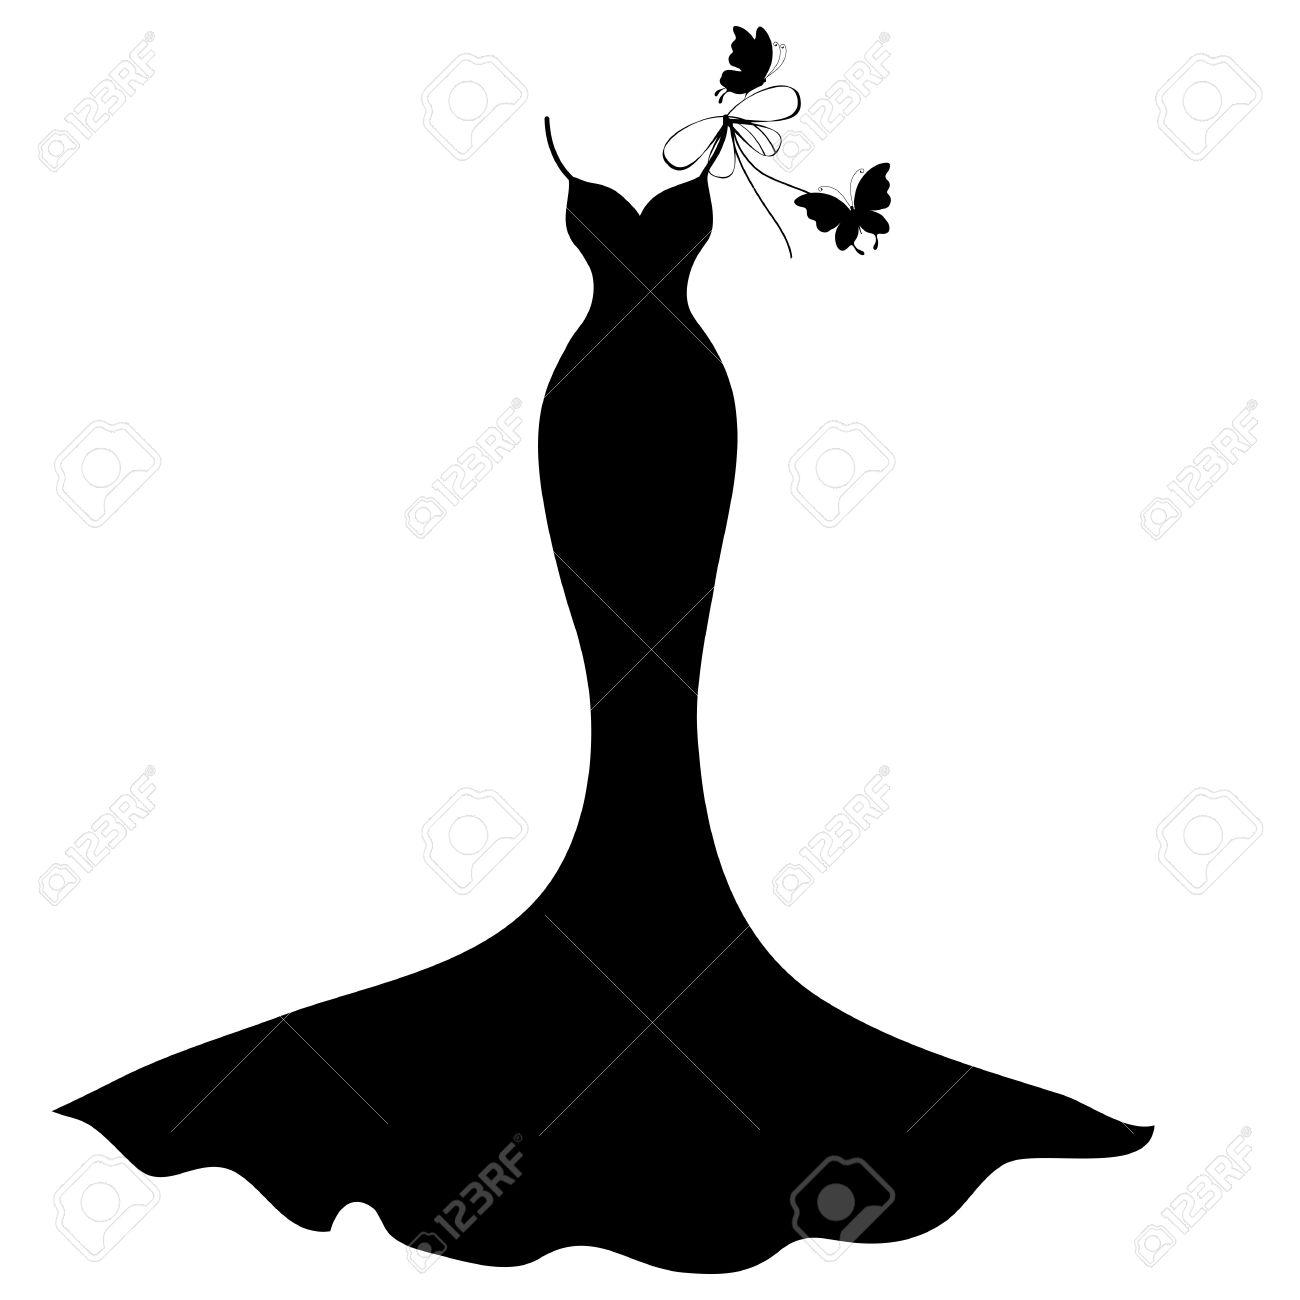 1300x1300 Wedding Dress Bride Silhouette Stock Vector Image